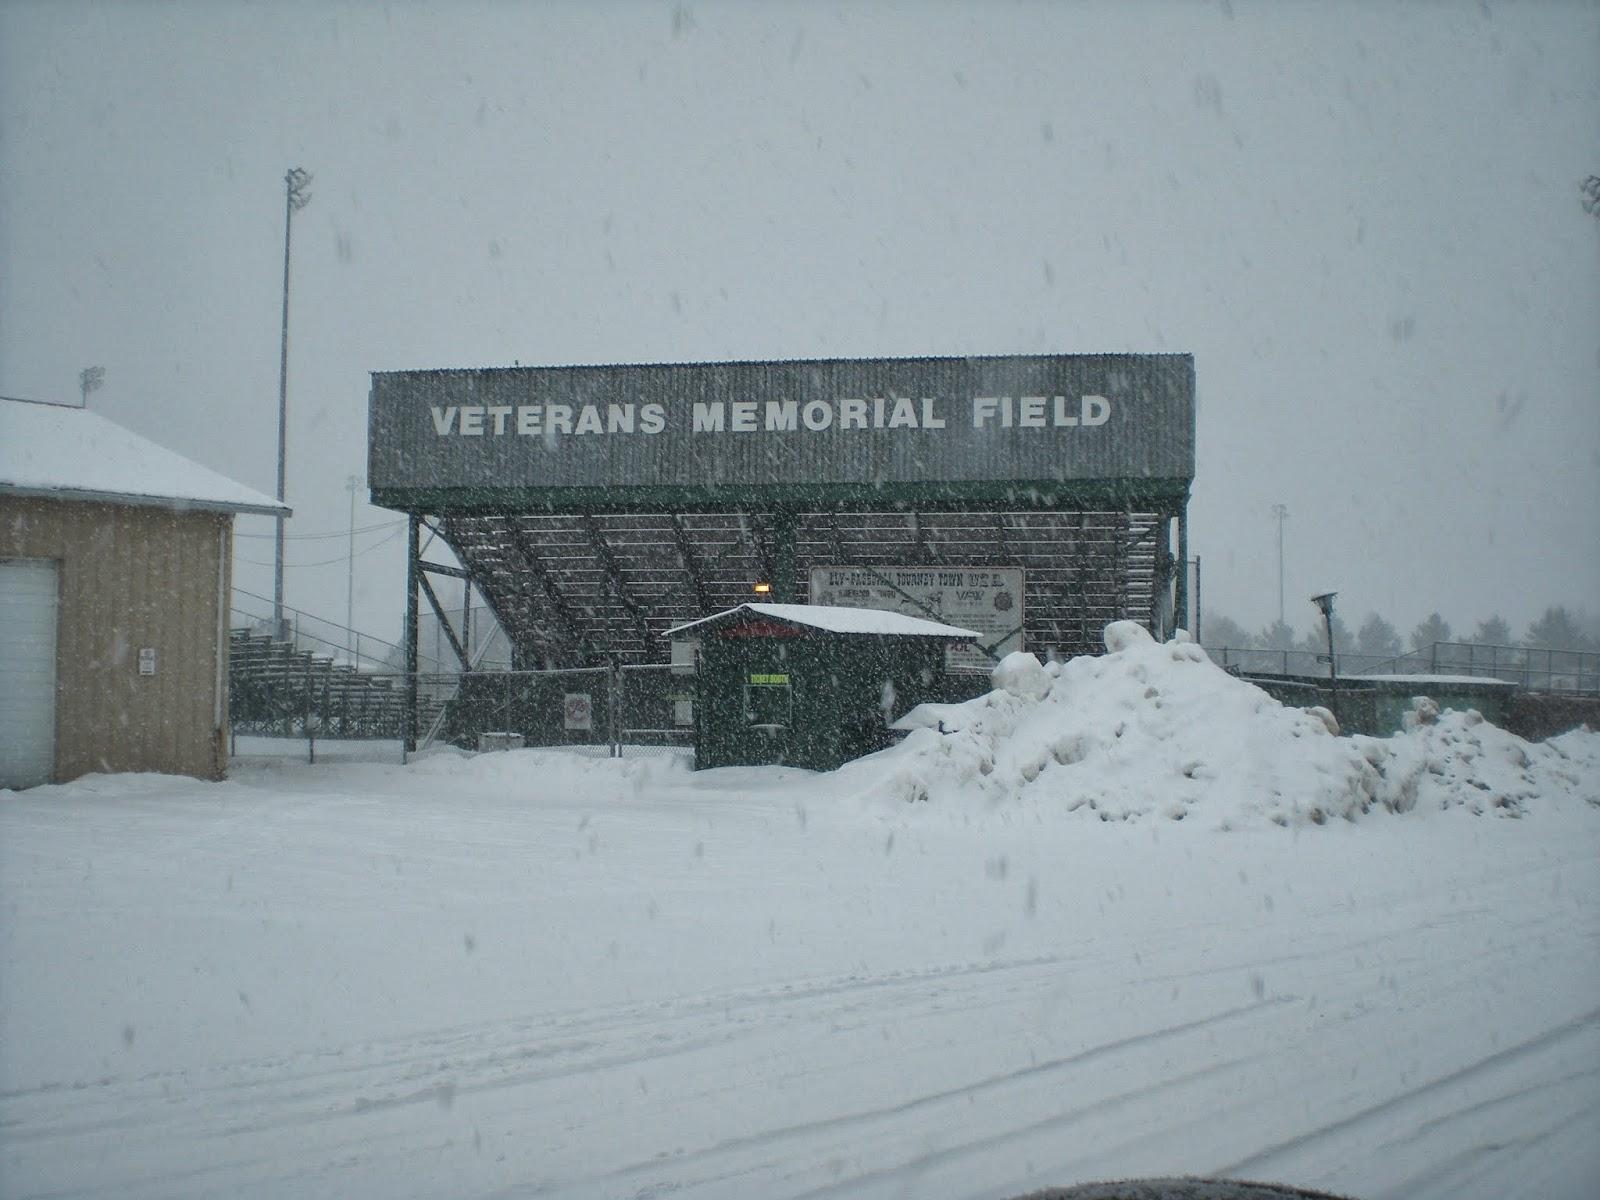 Ely, veterans, meorial, baseball, field, minnesota, snowstorm.